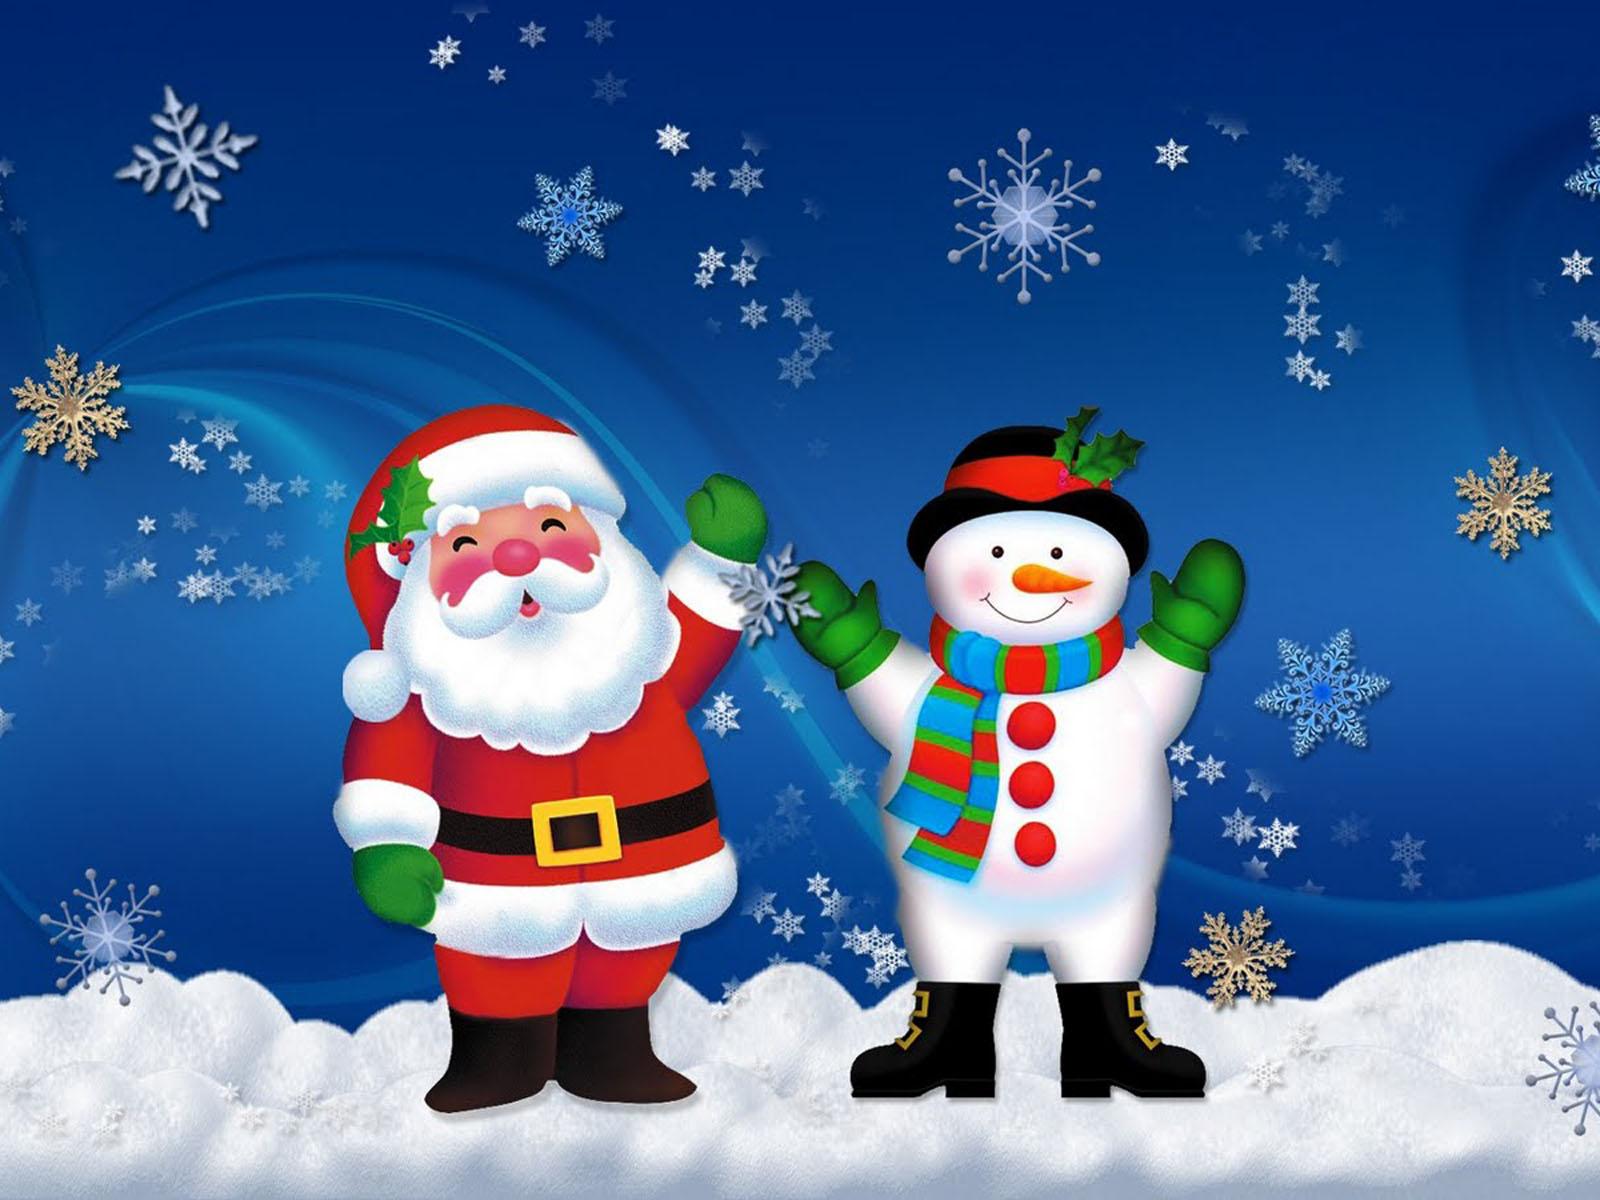 Christmas Snowman Wallpaper gallery